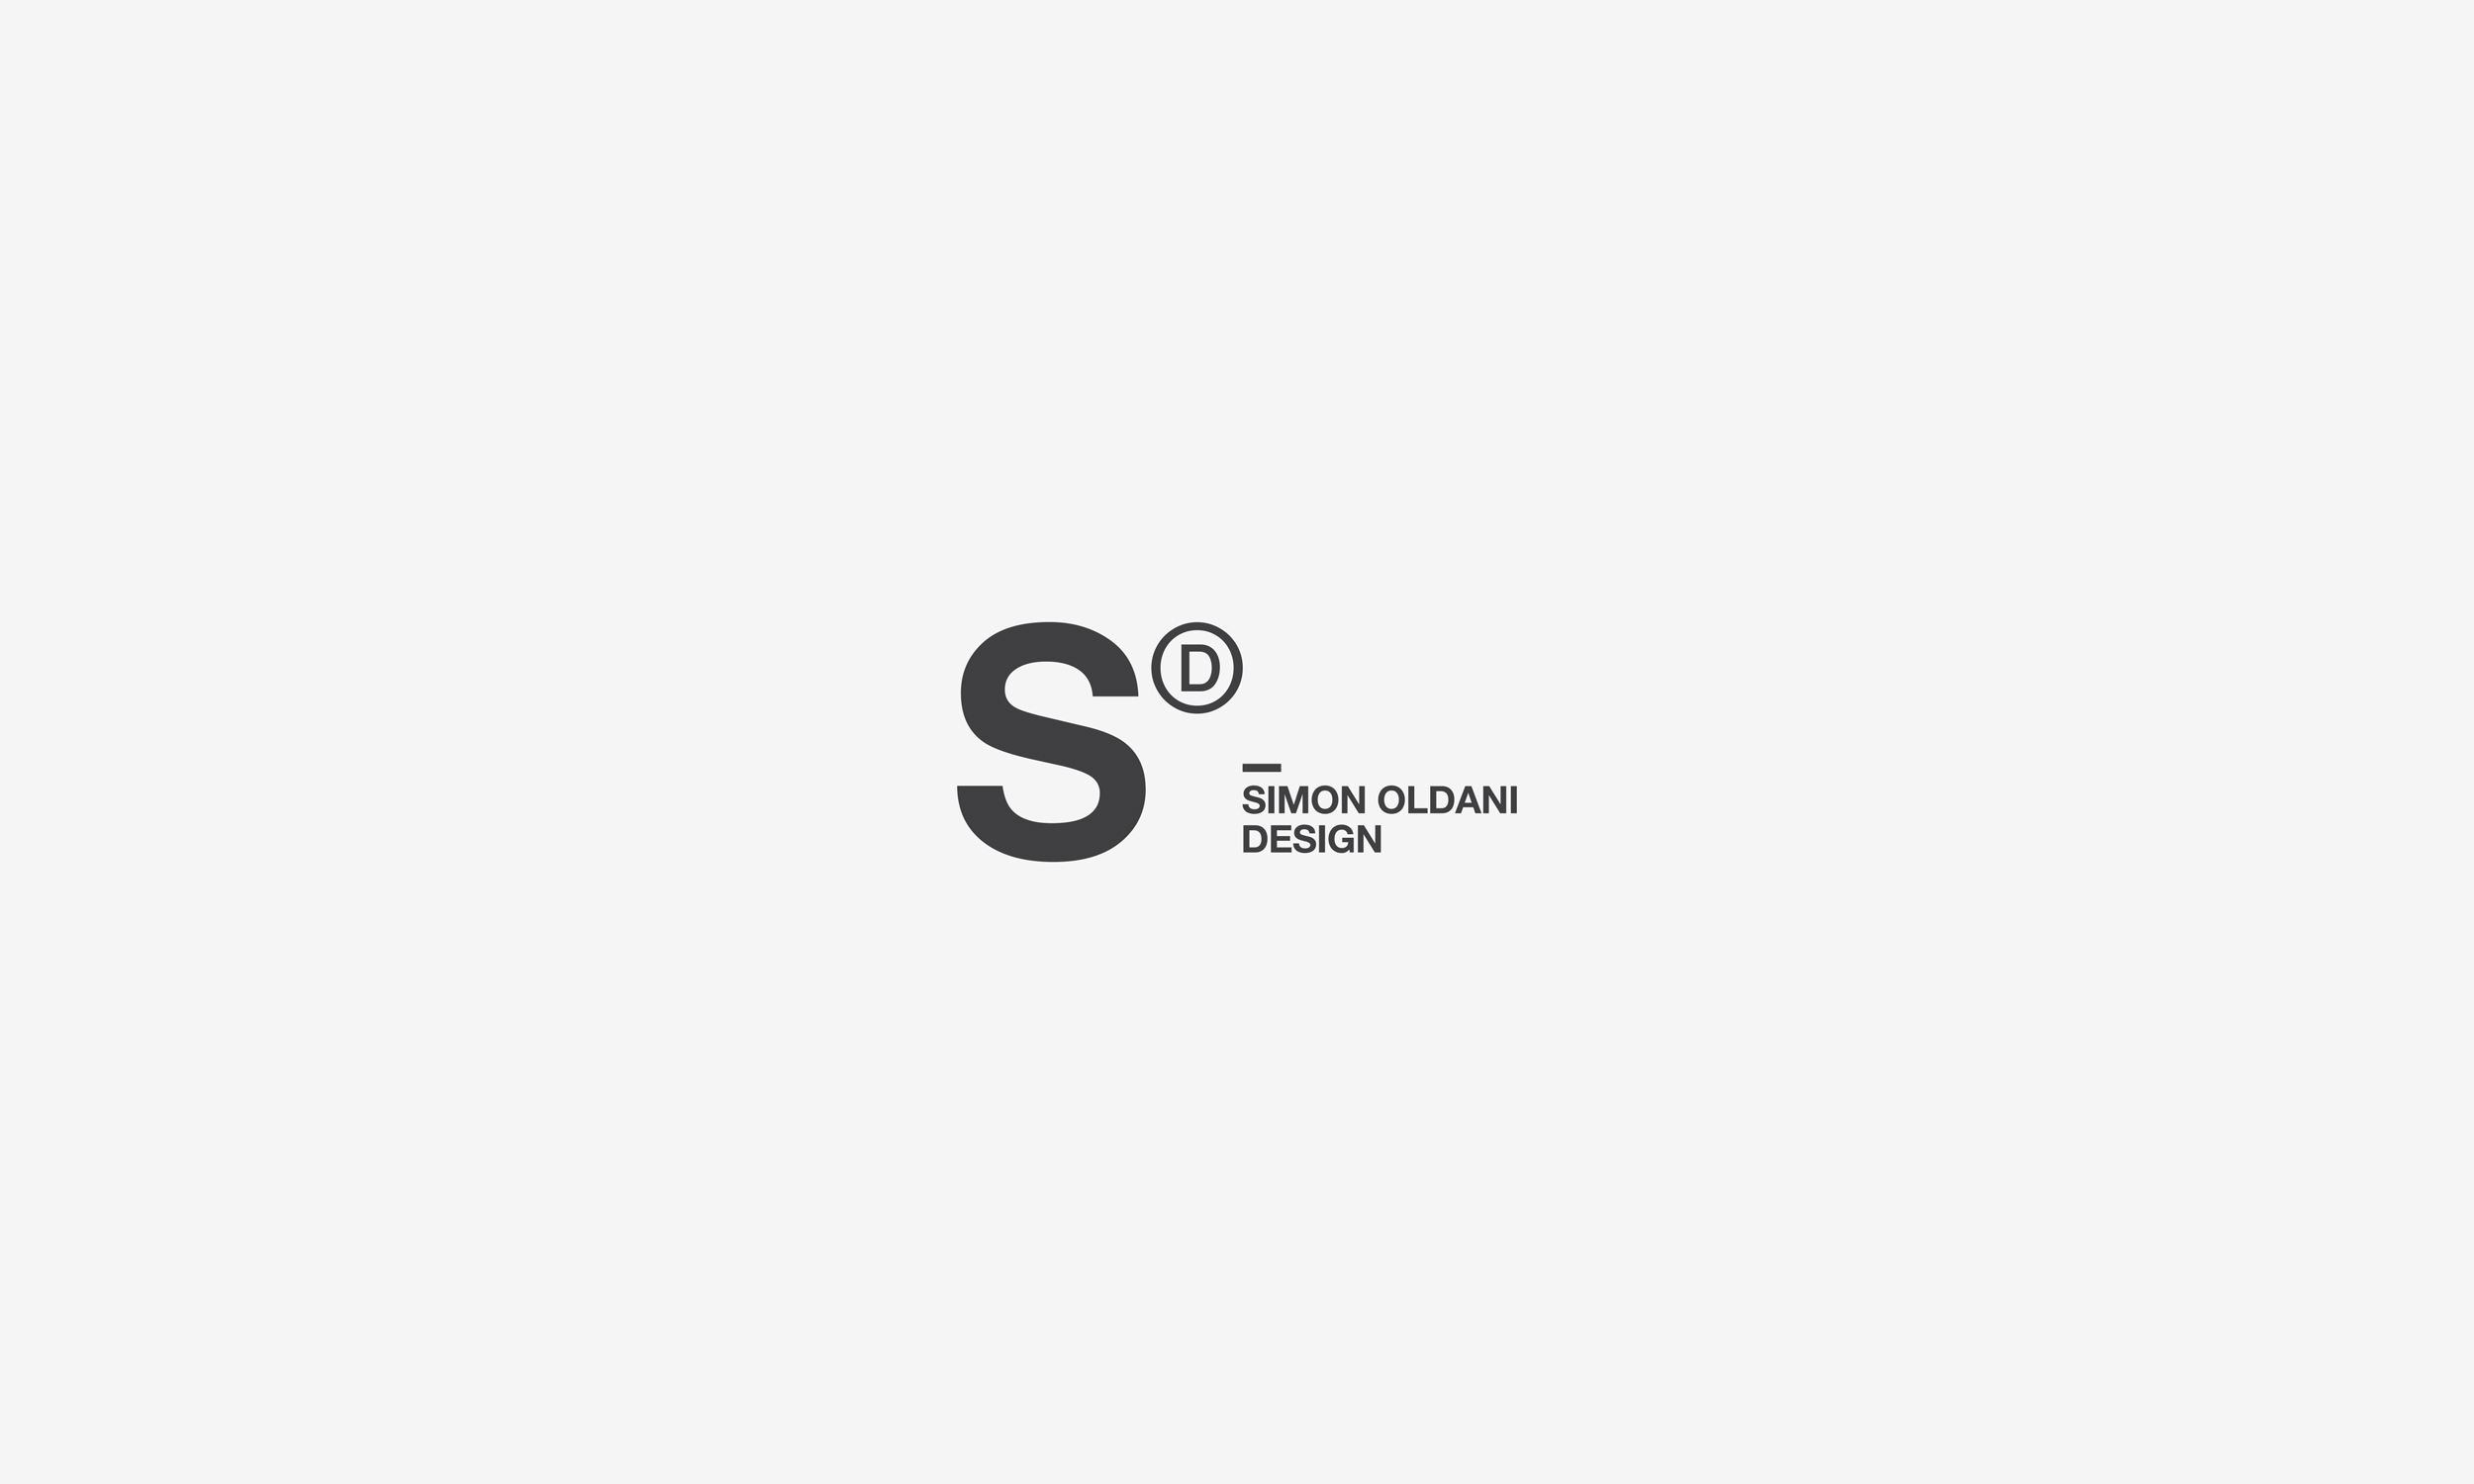 Simon Oldani Design logo horizontal design by SBDS